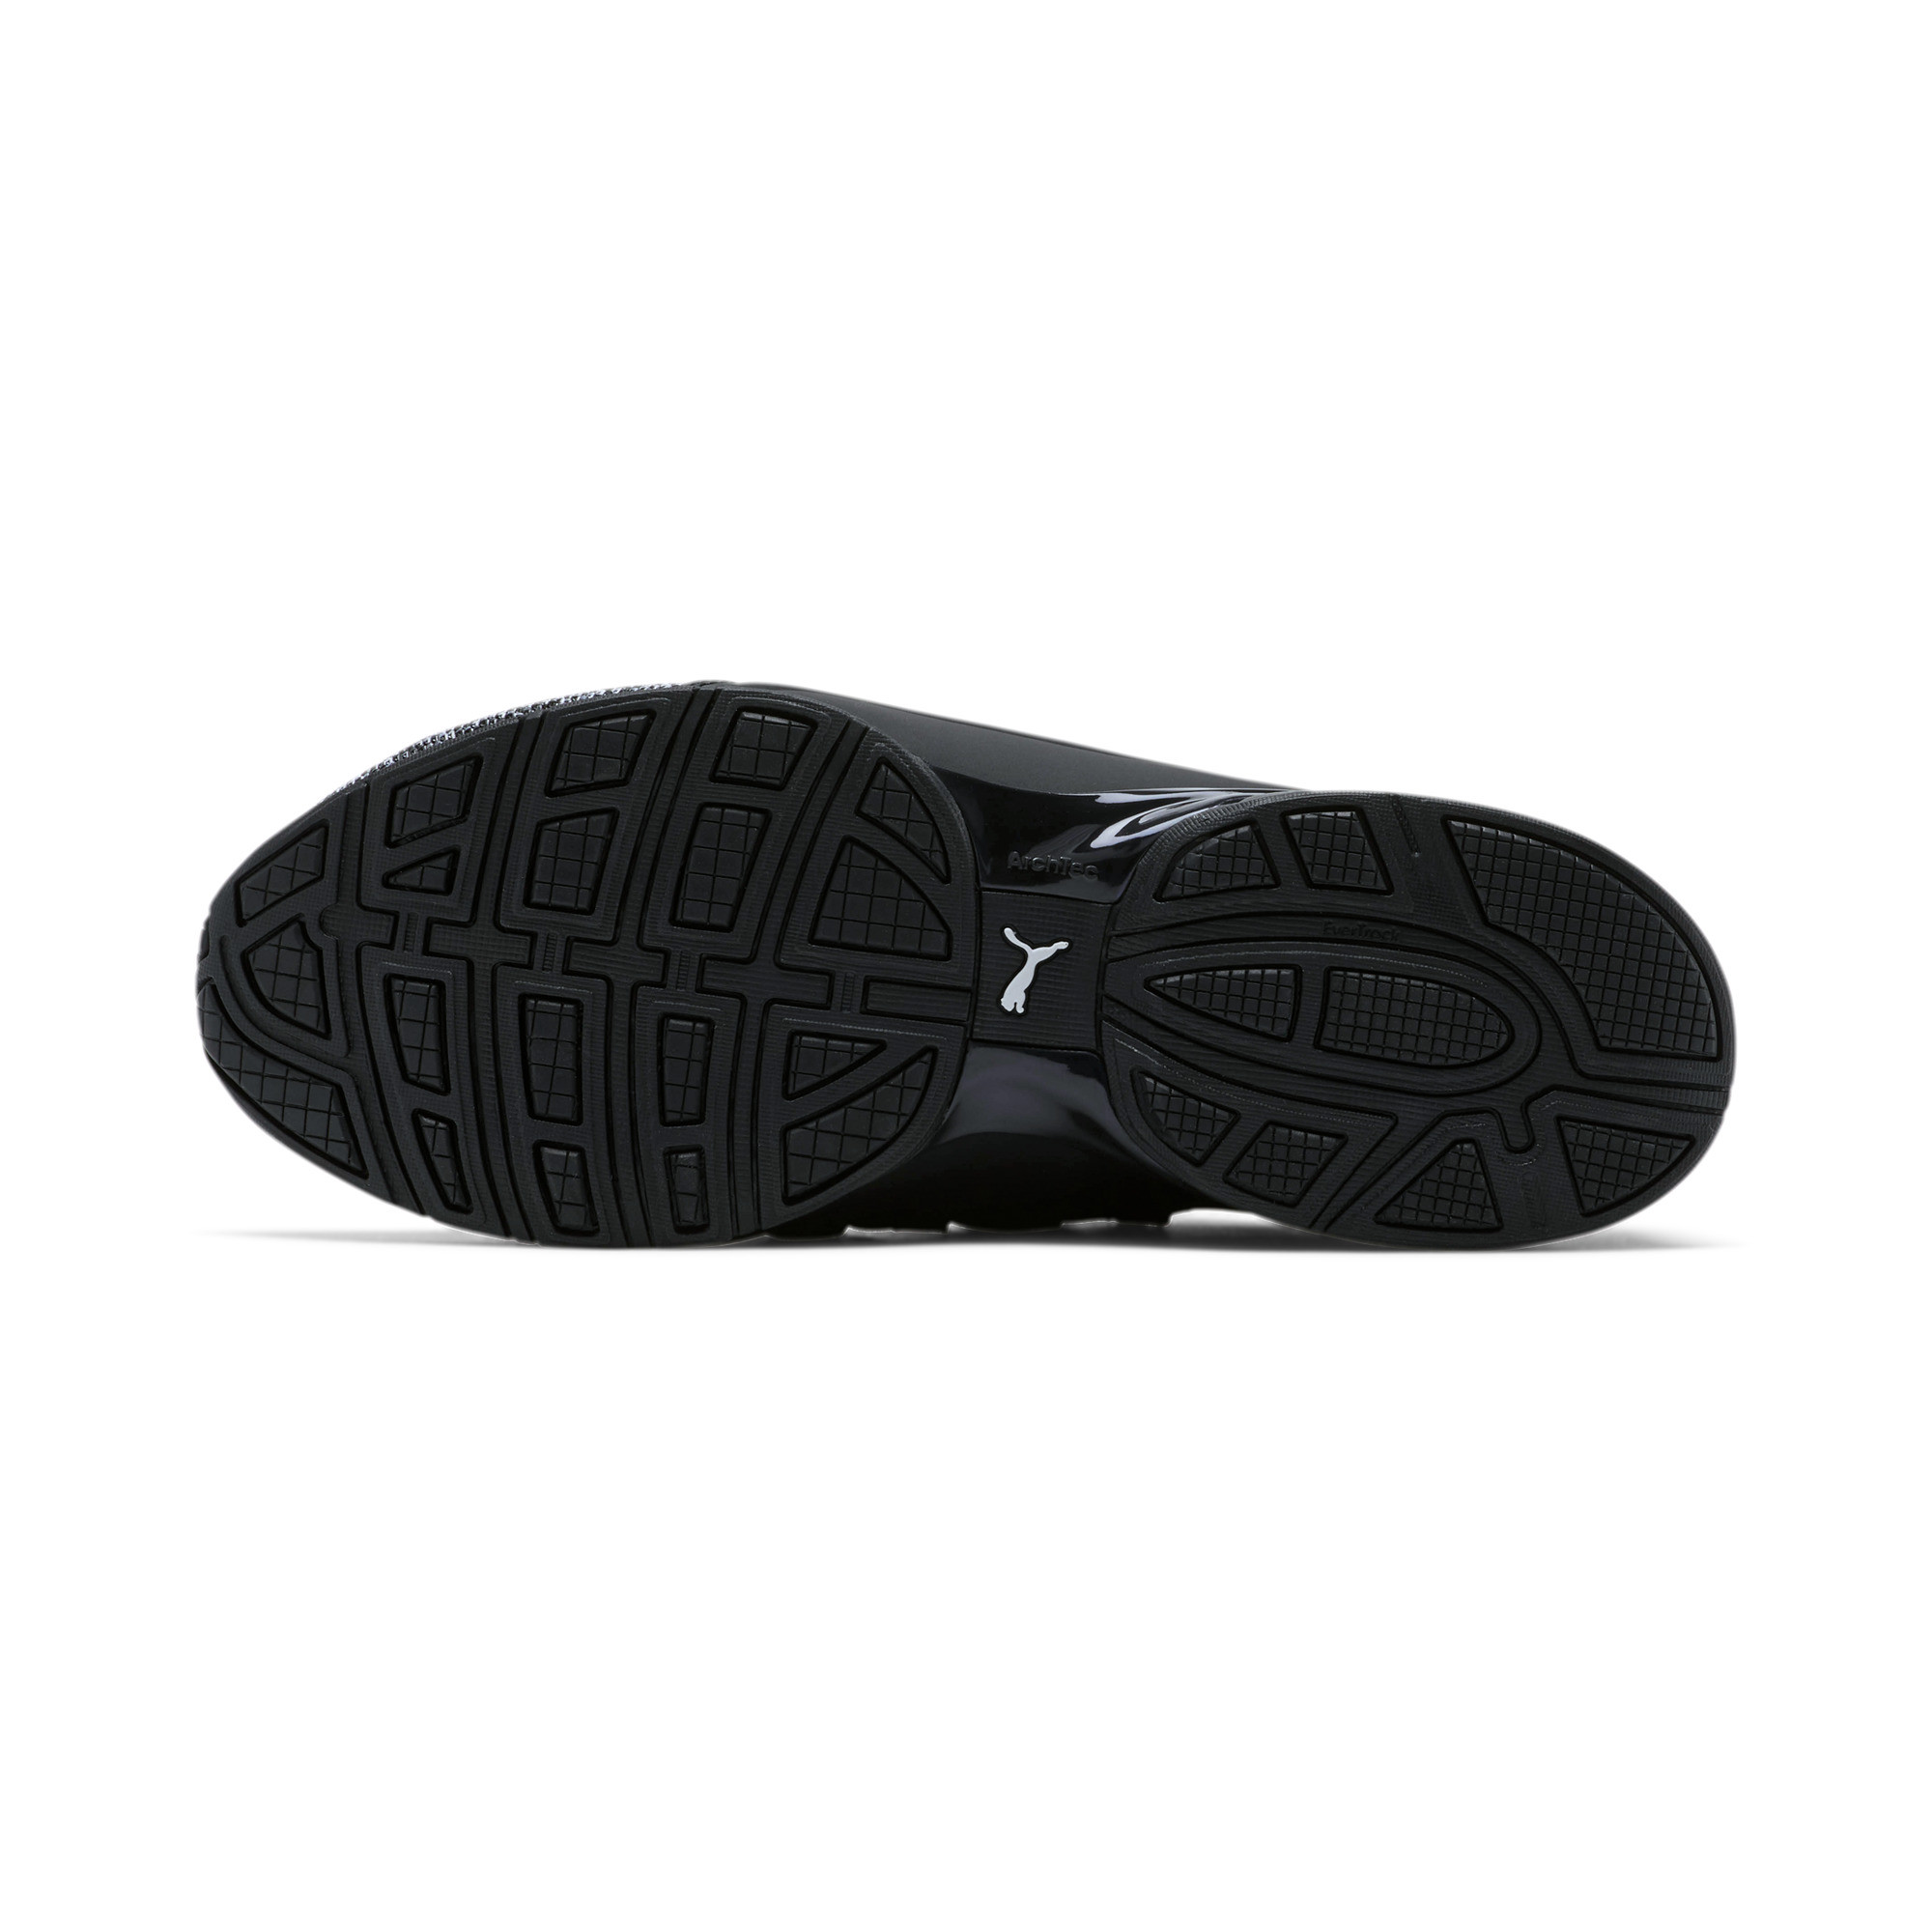 PUMA-Men-039-s-Momenta-Wide-Training-Shoes thumbnail 5